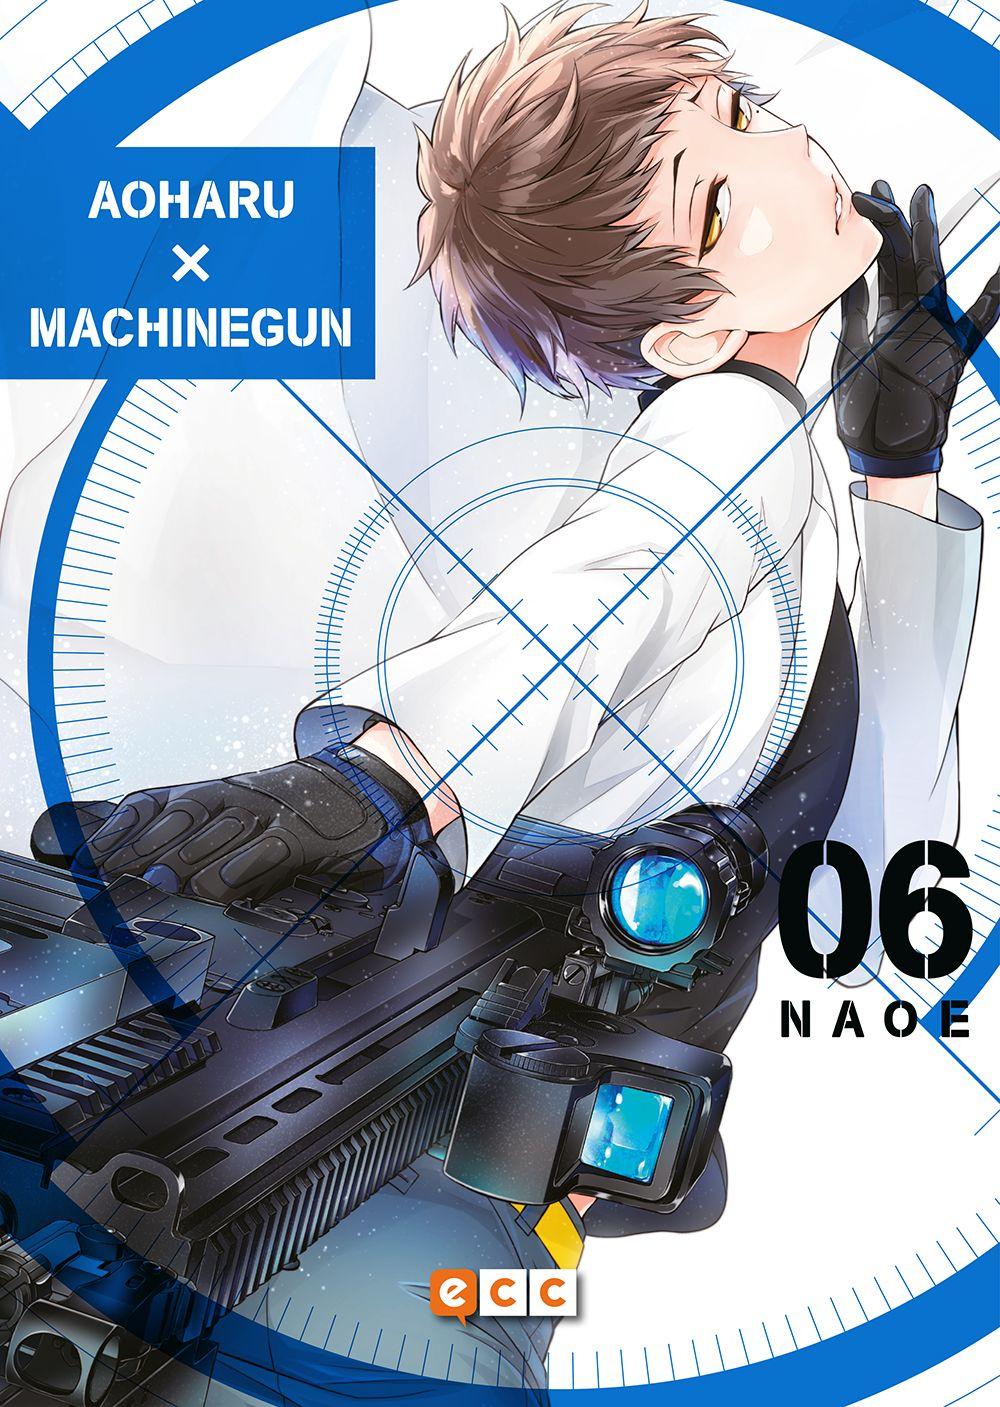 sobrecubierta_aoharu_x_machinegun_num6_web